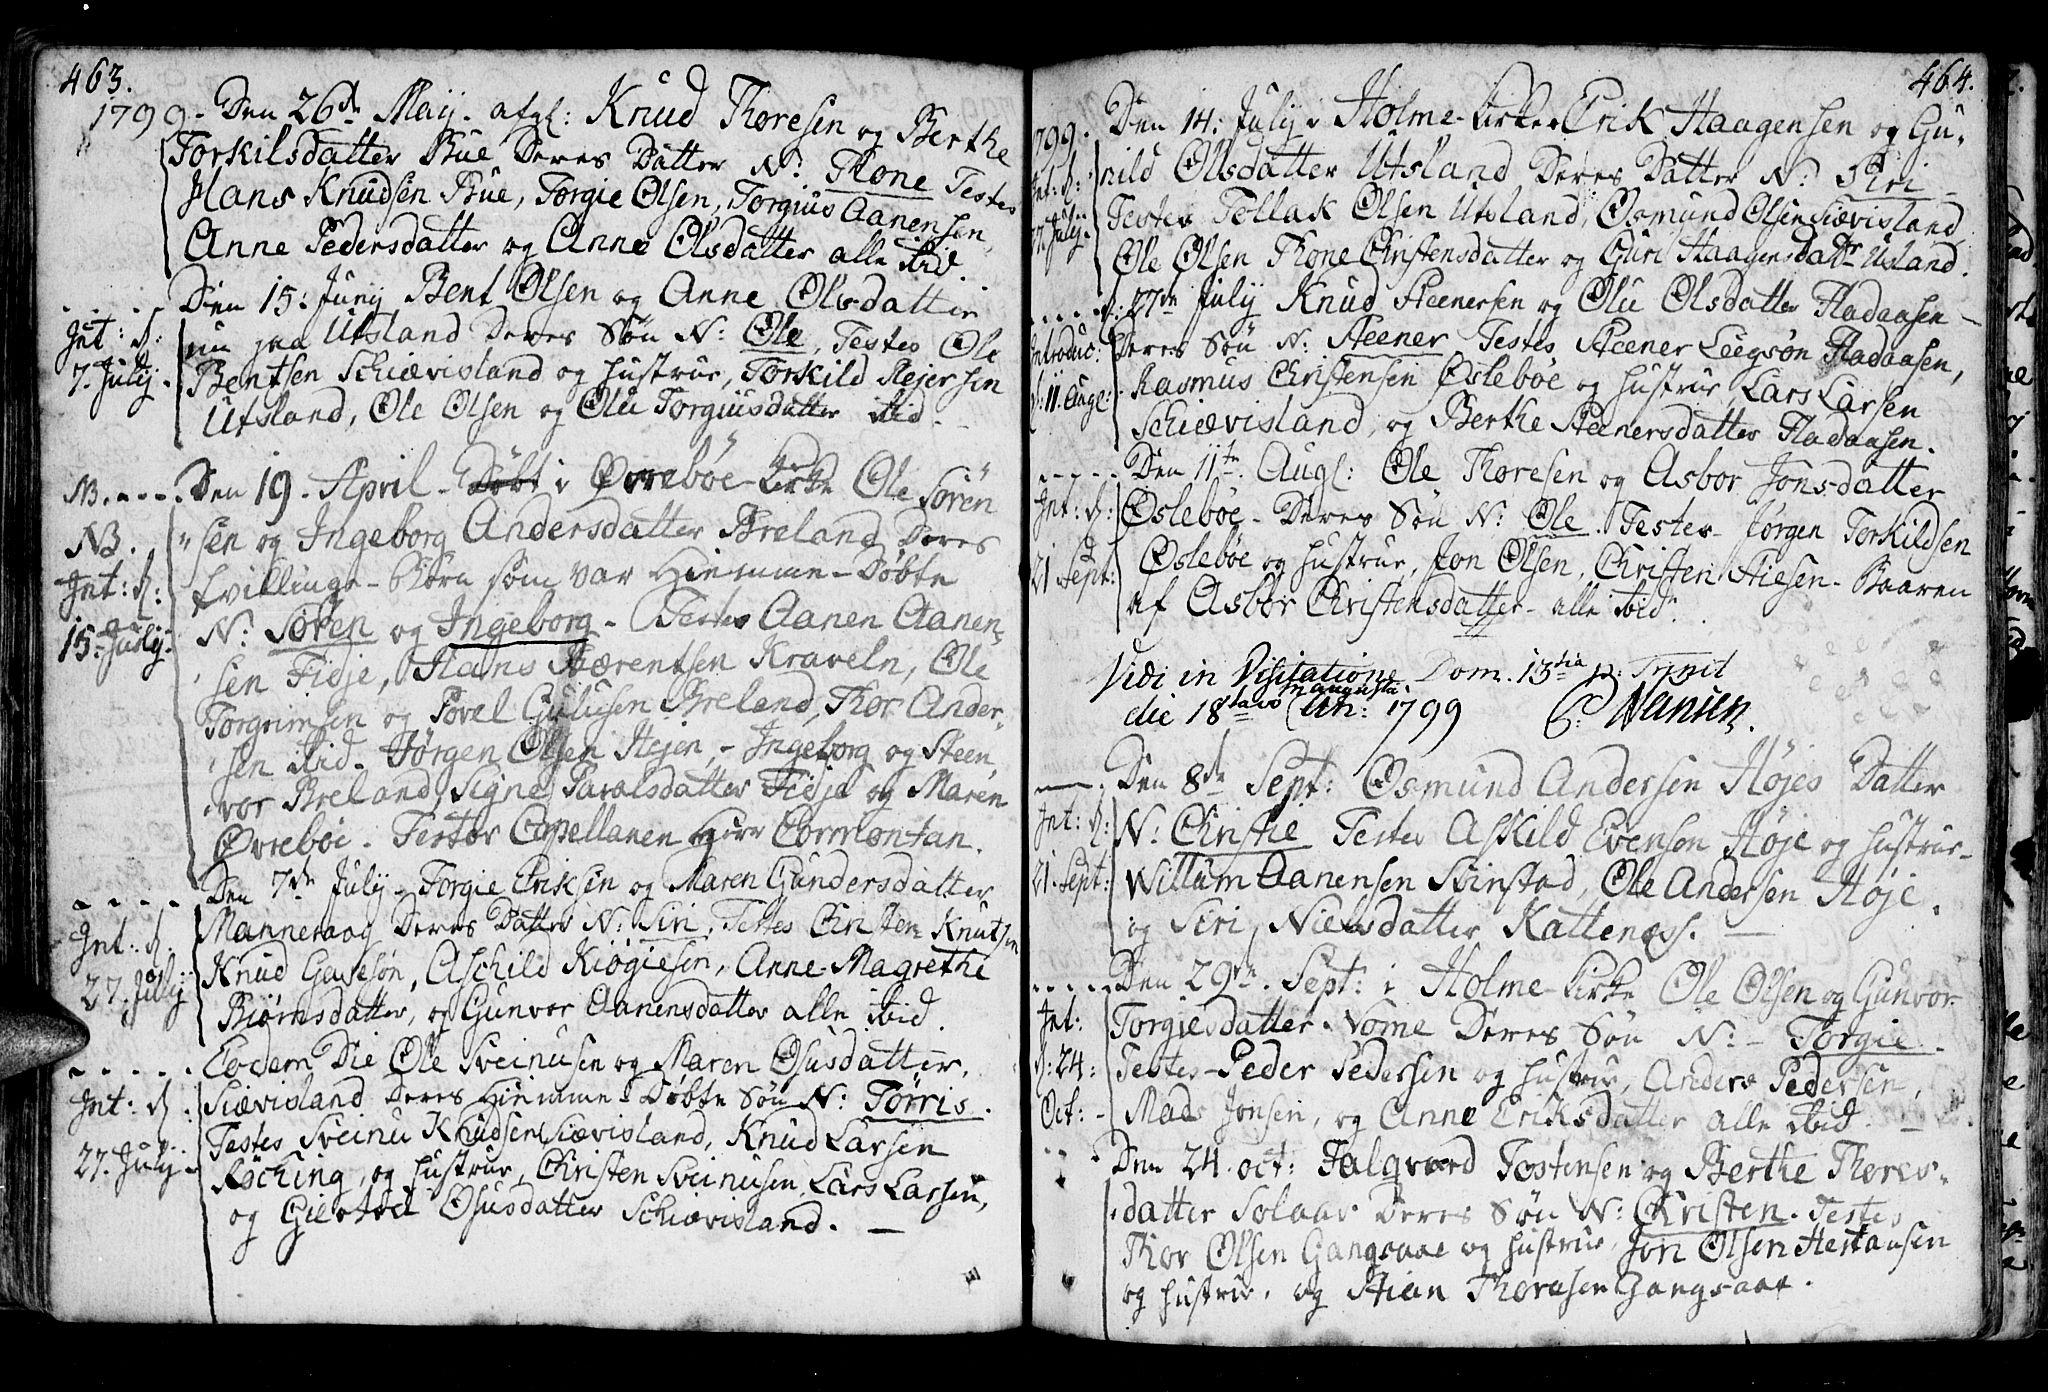 SAK, Holum sokneprestkontor, F/Fa/Fac/L0001: Ministerialbok nr. A 1, 1773-1820, s. 463-464